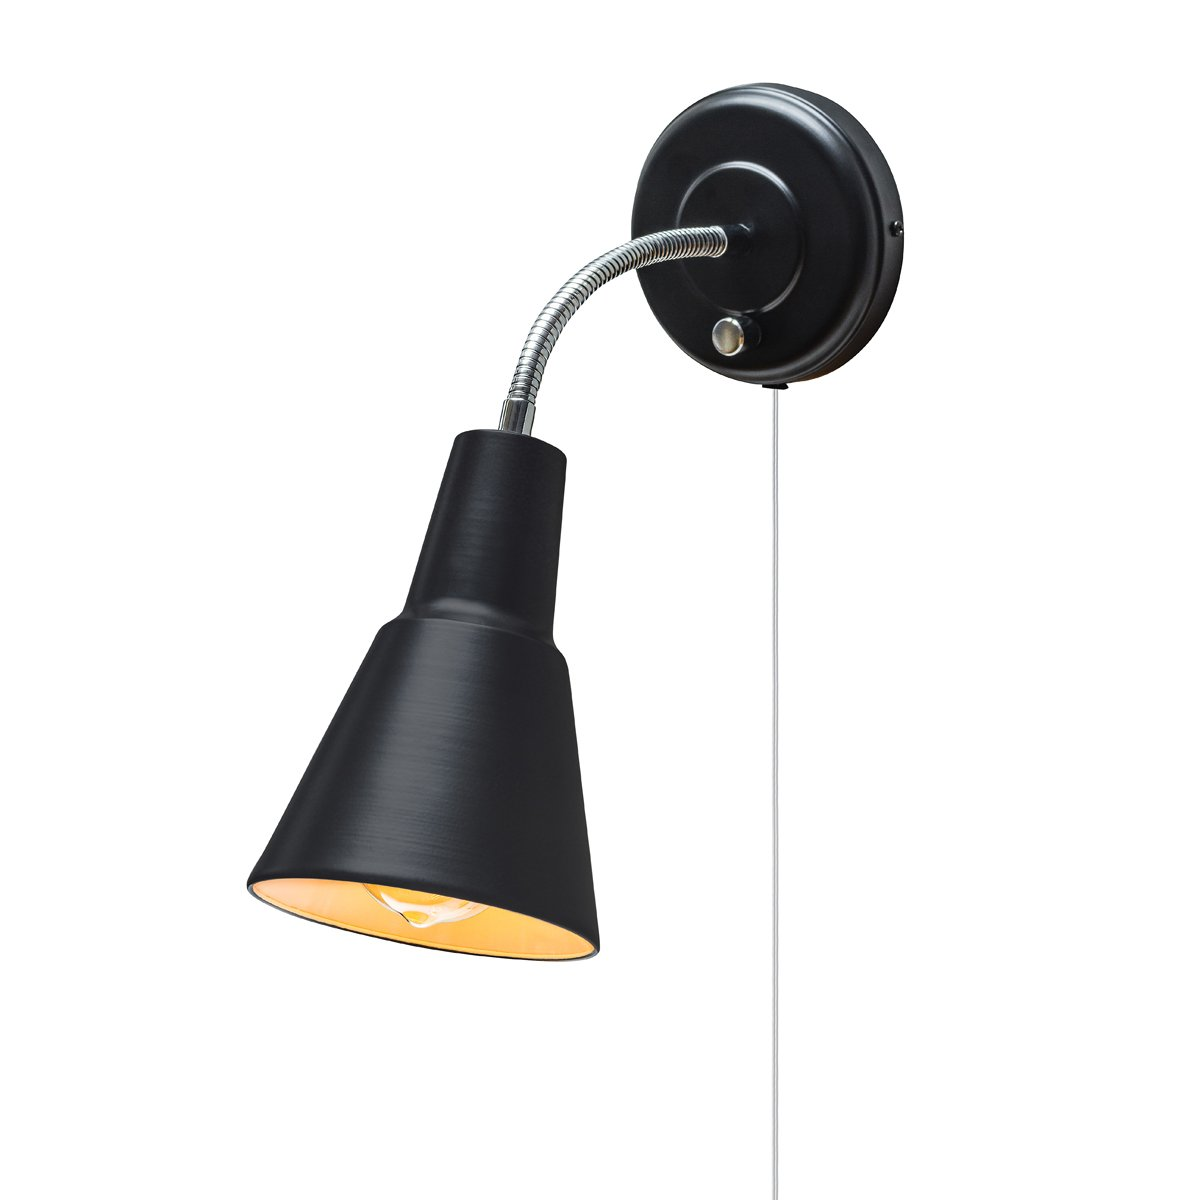 Globe Electric Ramezay 1-Light Plug-In or Hardwire Task Wall Sconce, Chrome Gooseneck, Matte Black Finish, 6 Foot Clear Cord, 65312